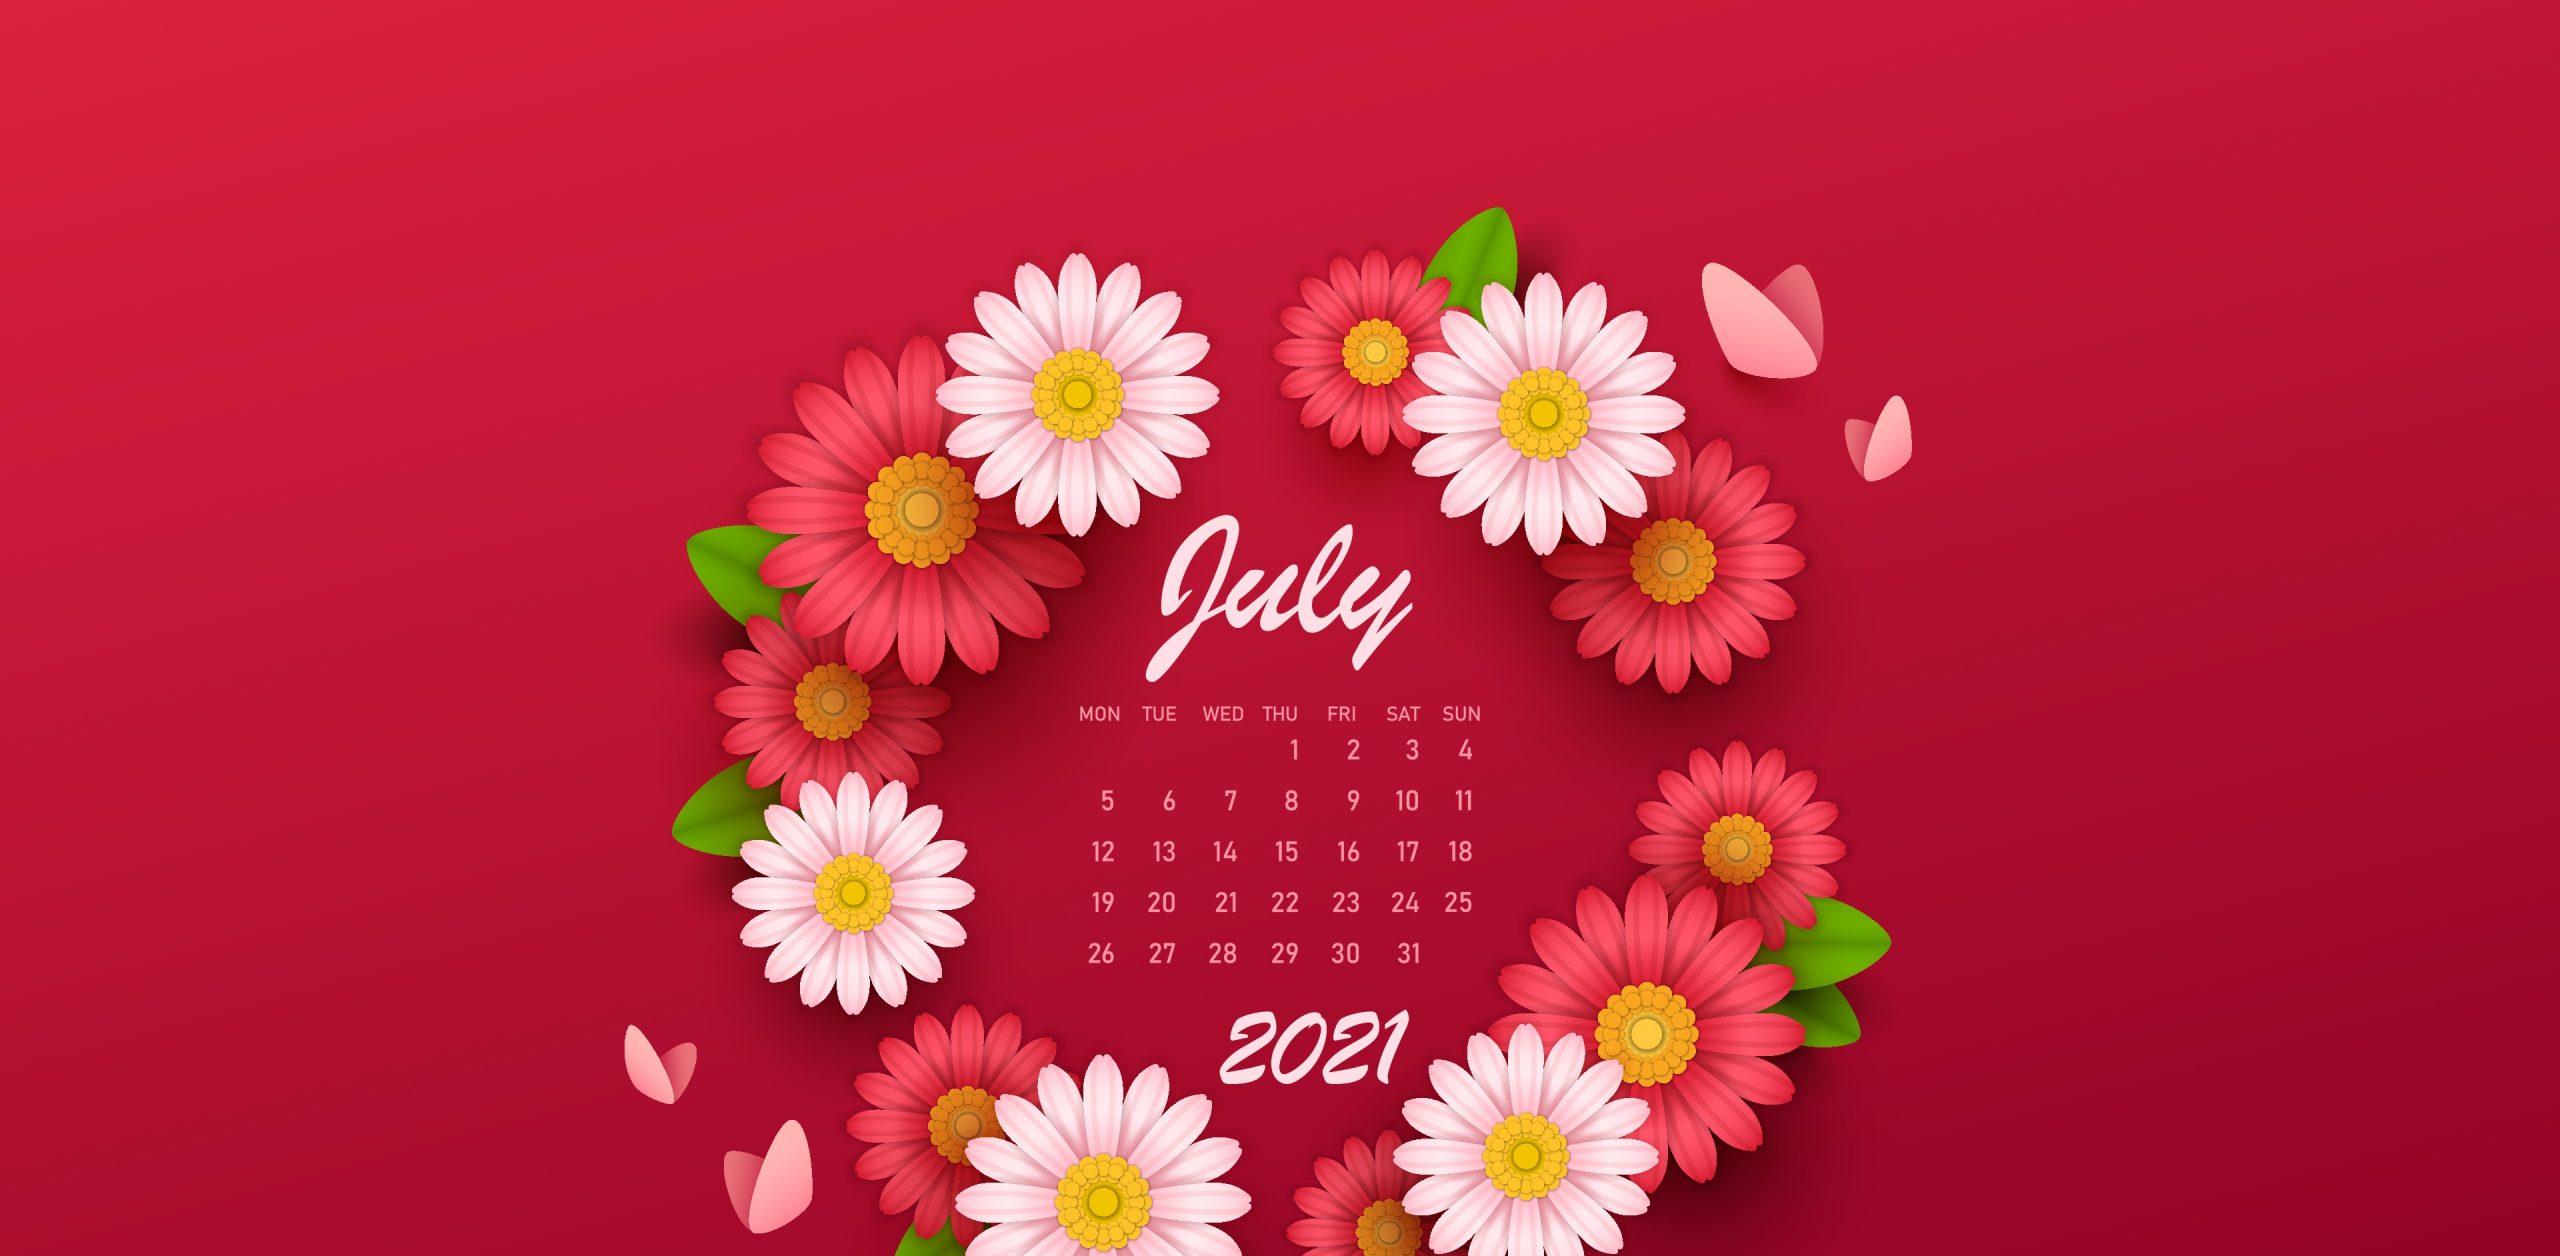 July 2021 Screensaver Calendar Wallpaper